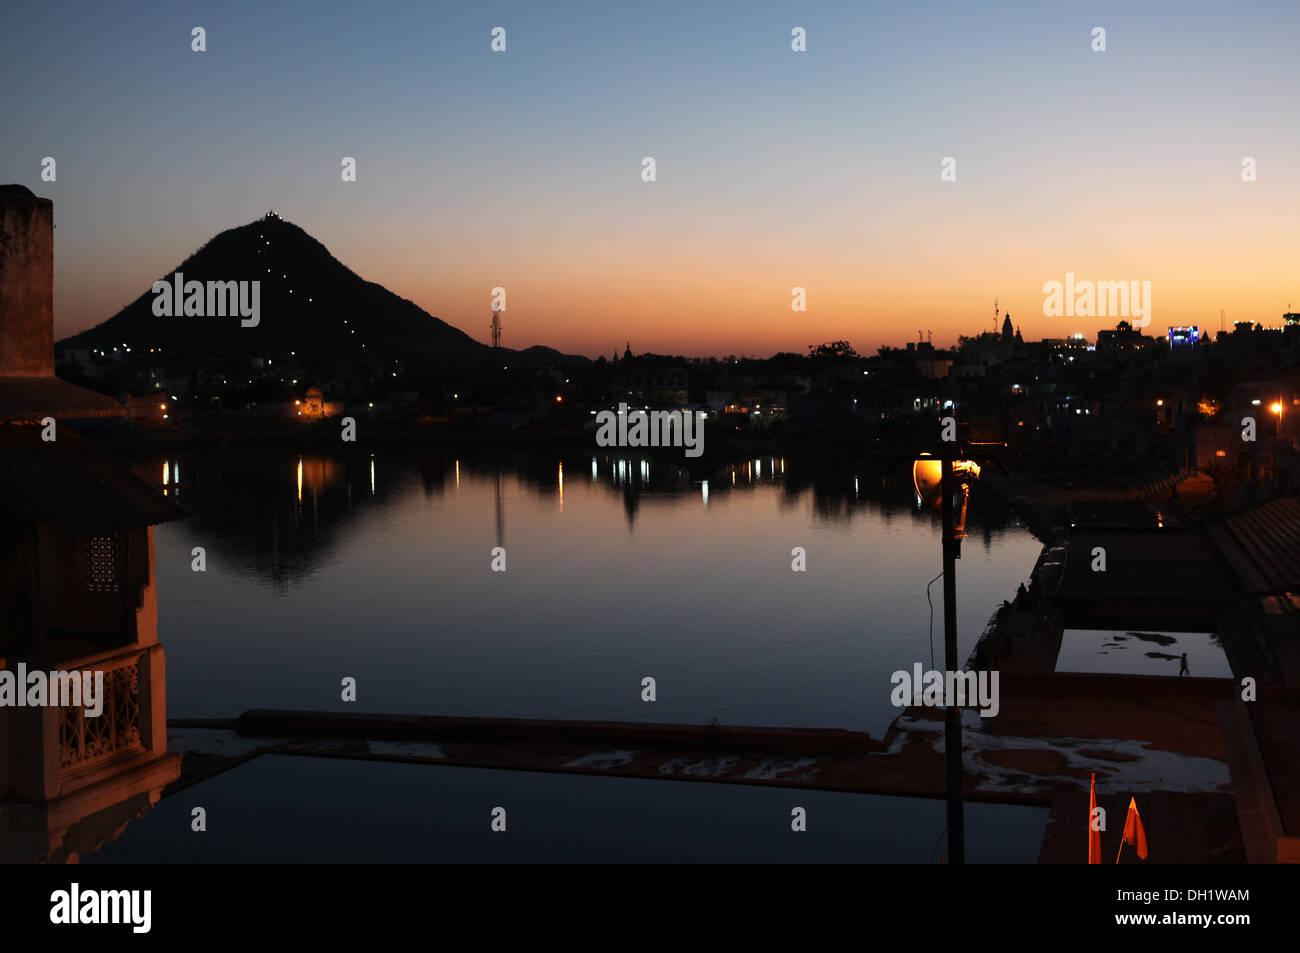 View across the holy lake towards Mount Ratnagiri,Pushkar,Rajasthan,India. - Stock Image